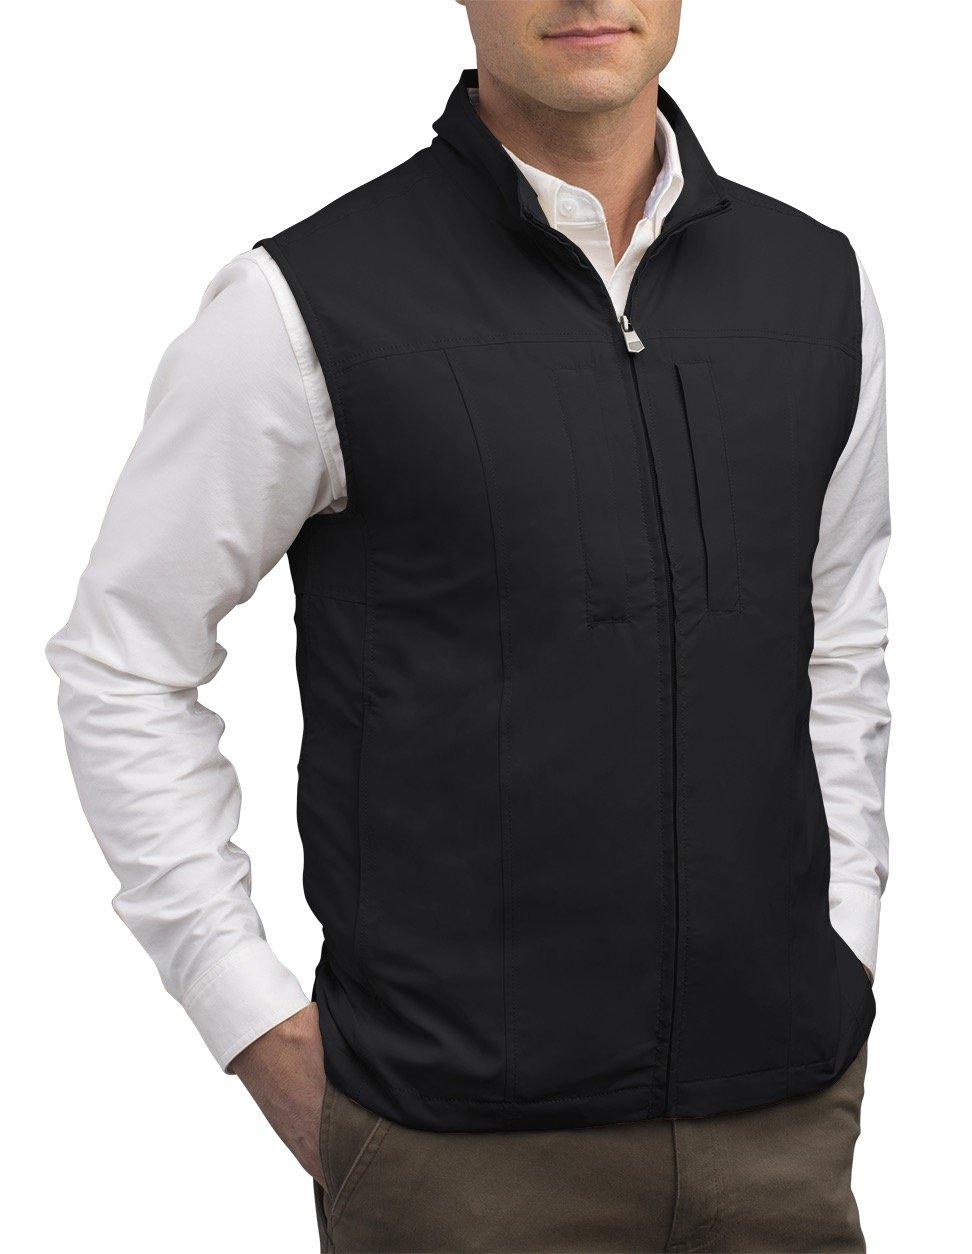 SCOTTeVEST Men's RFID Travel Vest - 26 Pockets – Travel Clothing (Large Tall, Black)